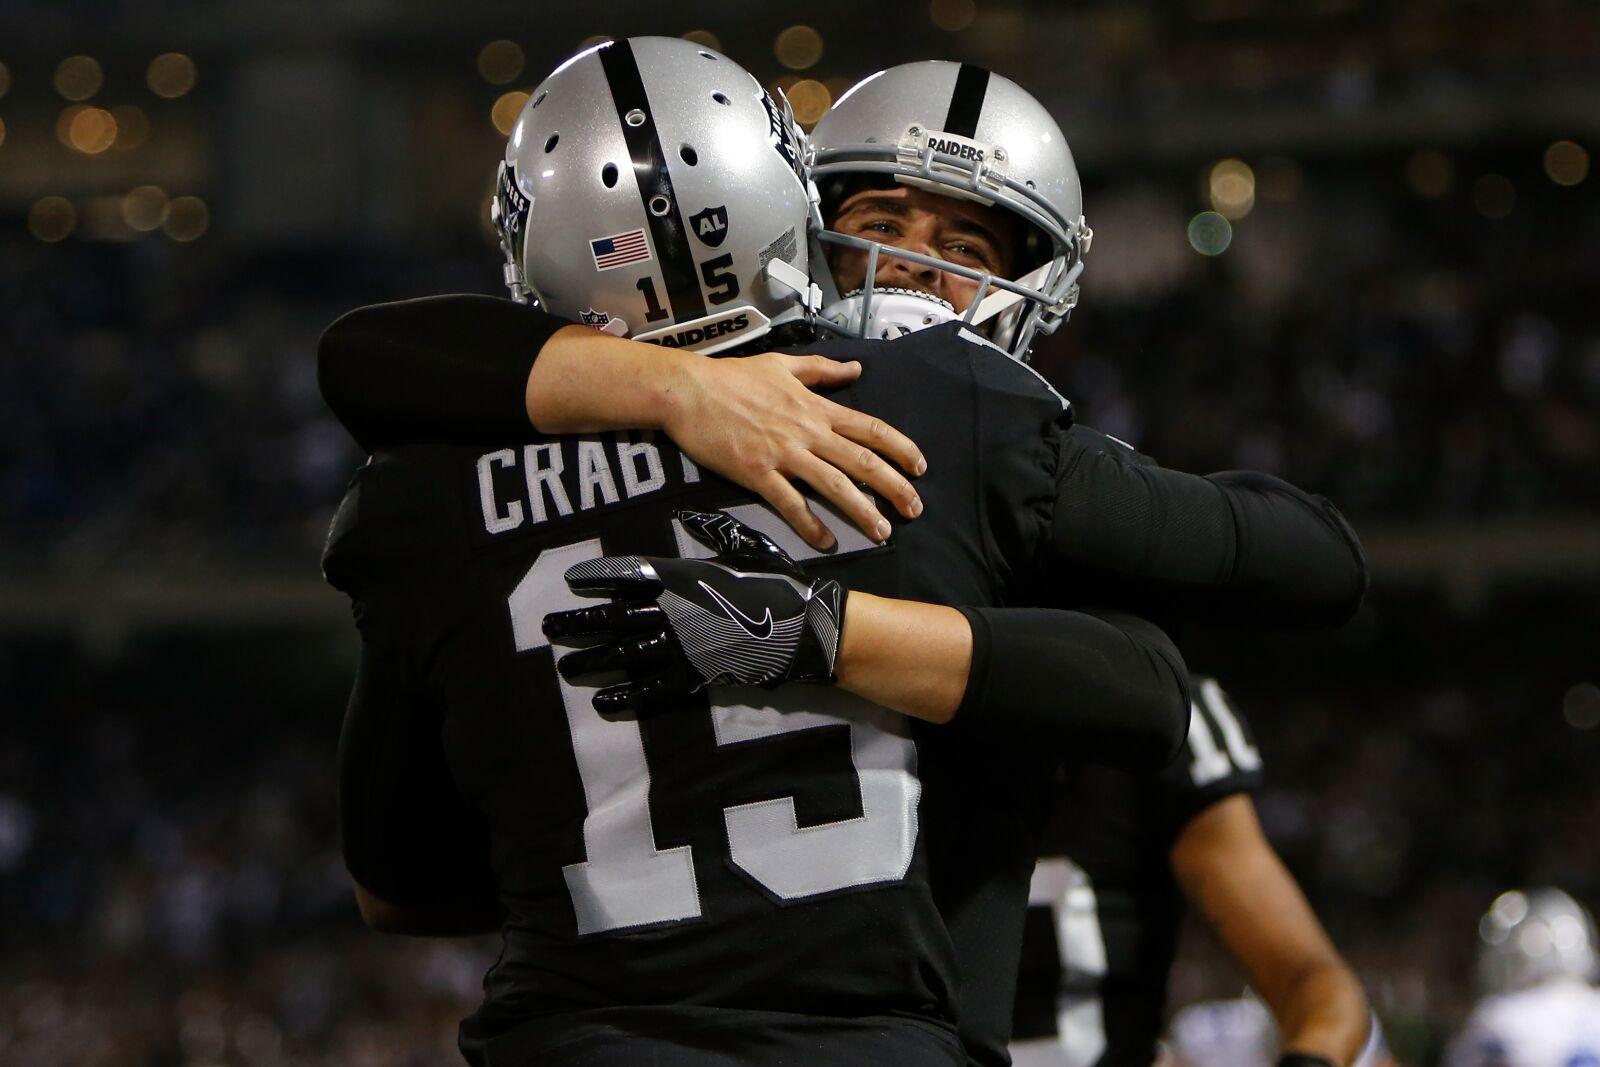 Raiders: Could signing Michael Crabtree save Derek Carr's season?